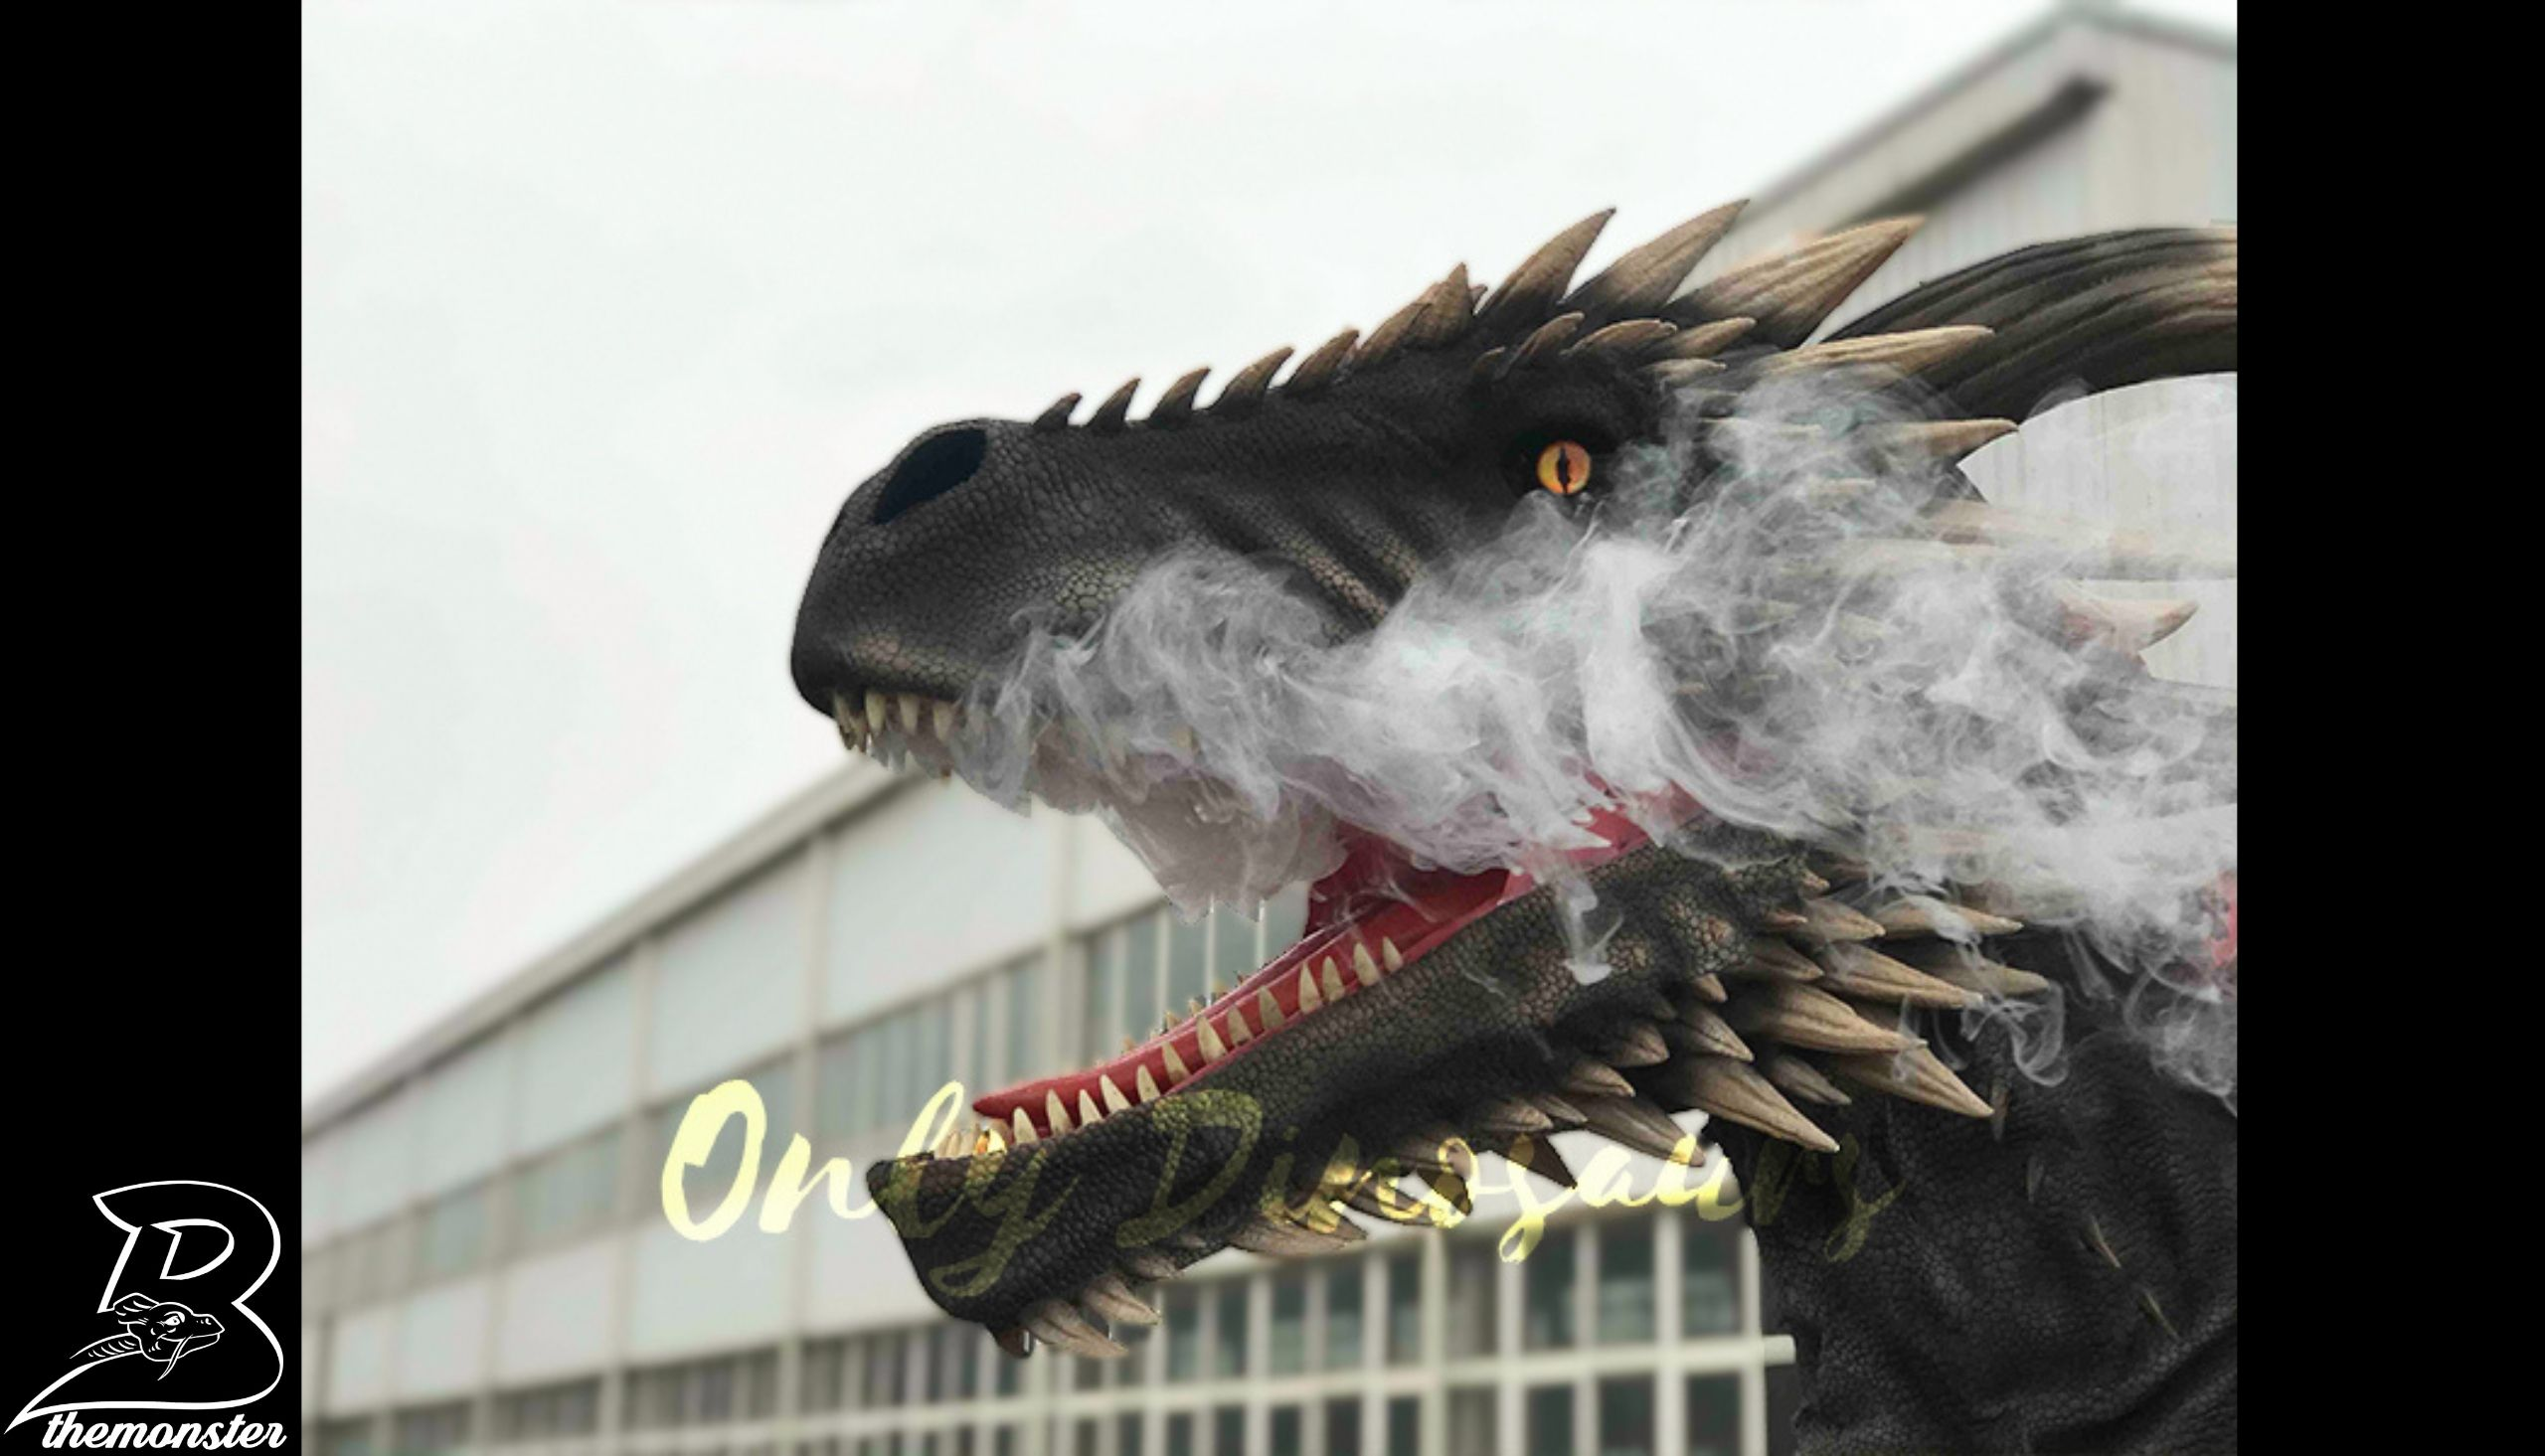 Coolest Black Flying Dragon with hidden legs Costume Per Shop Bthemonster.com